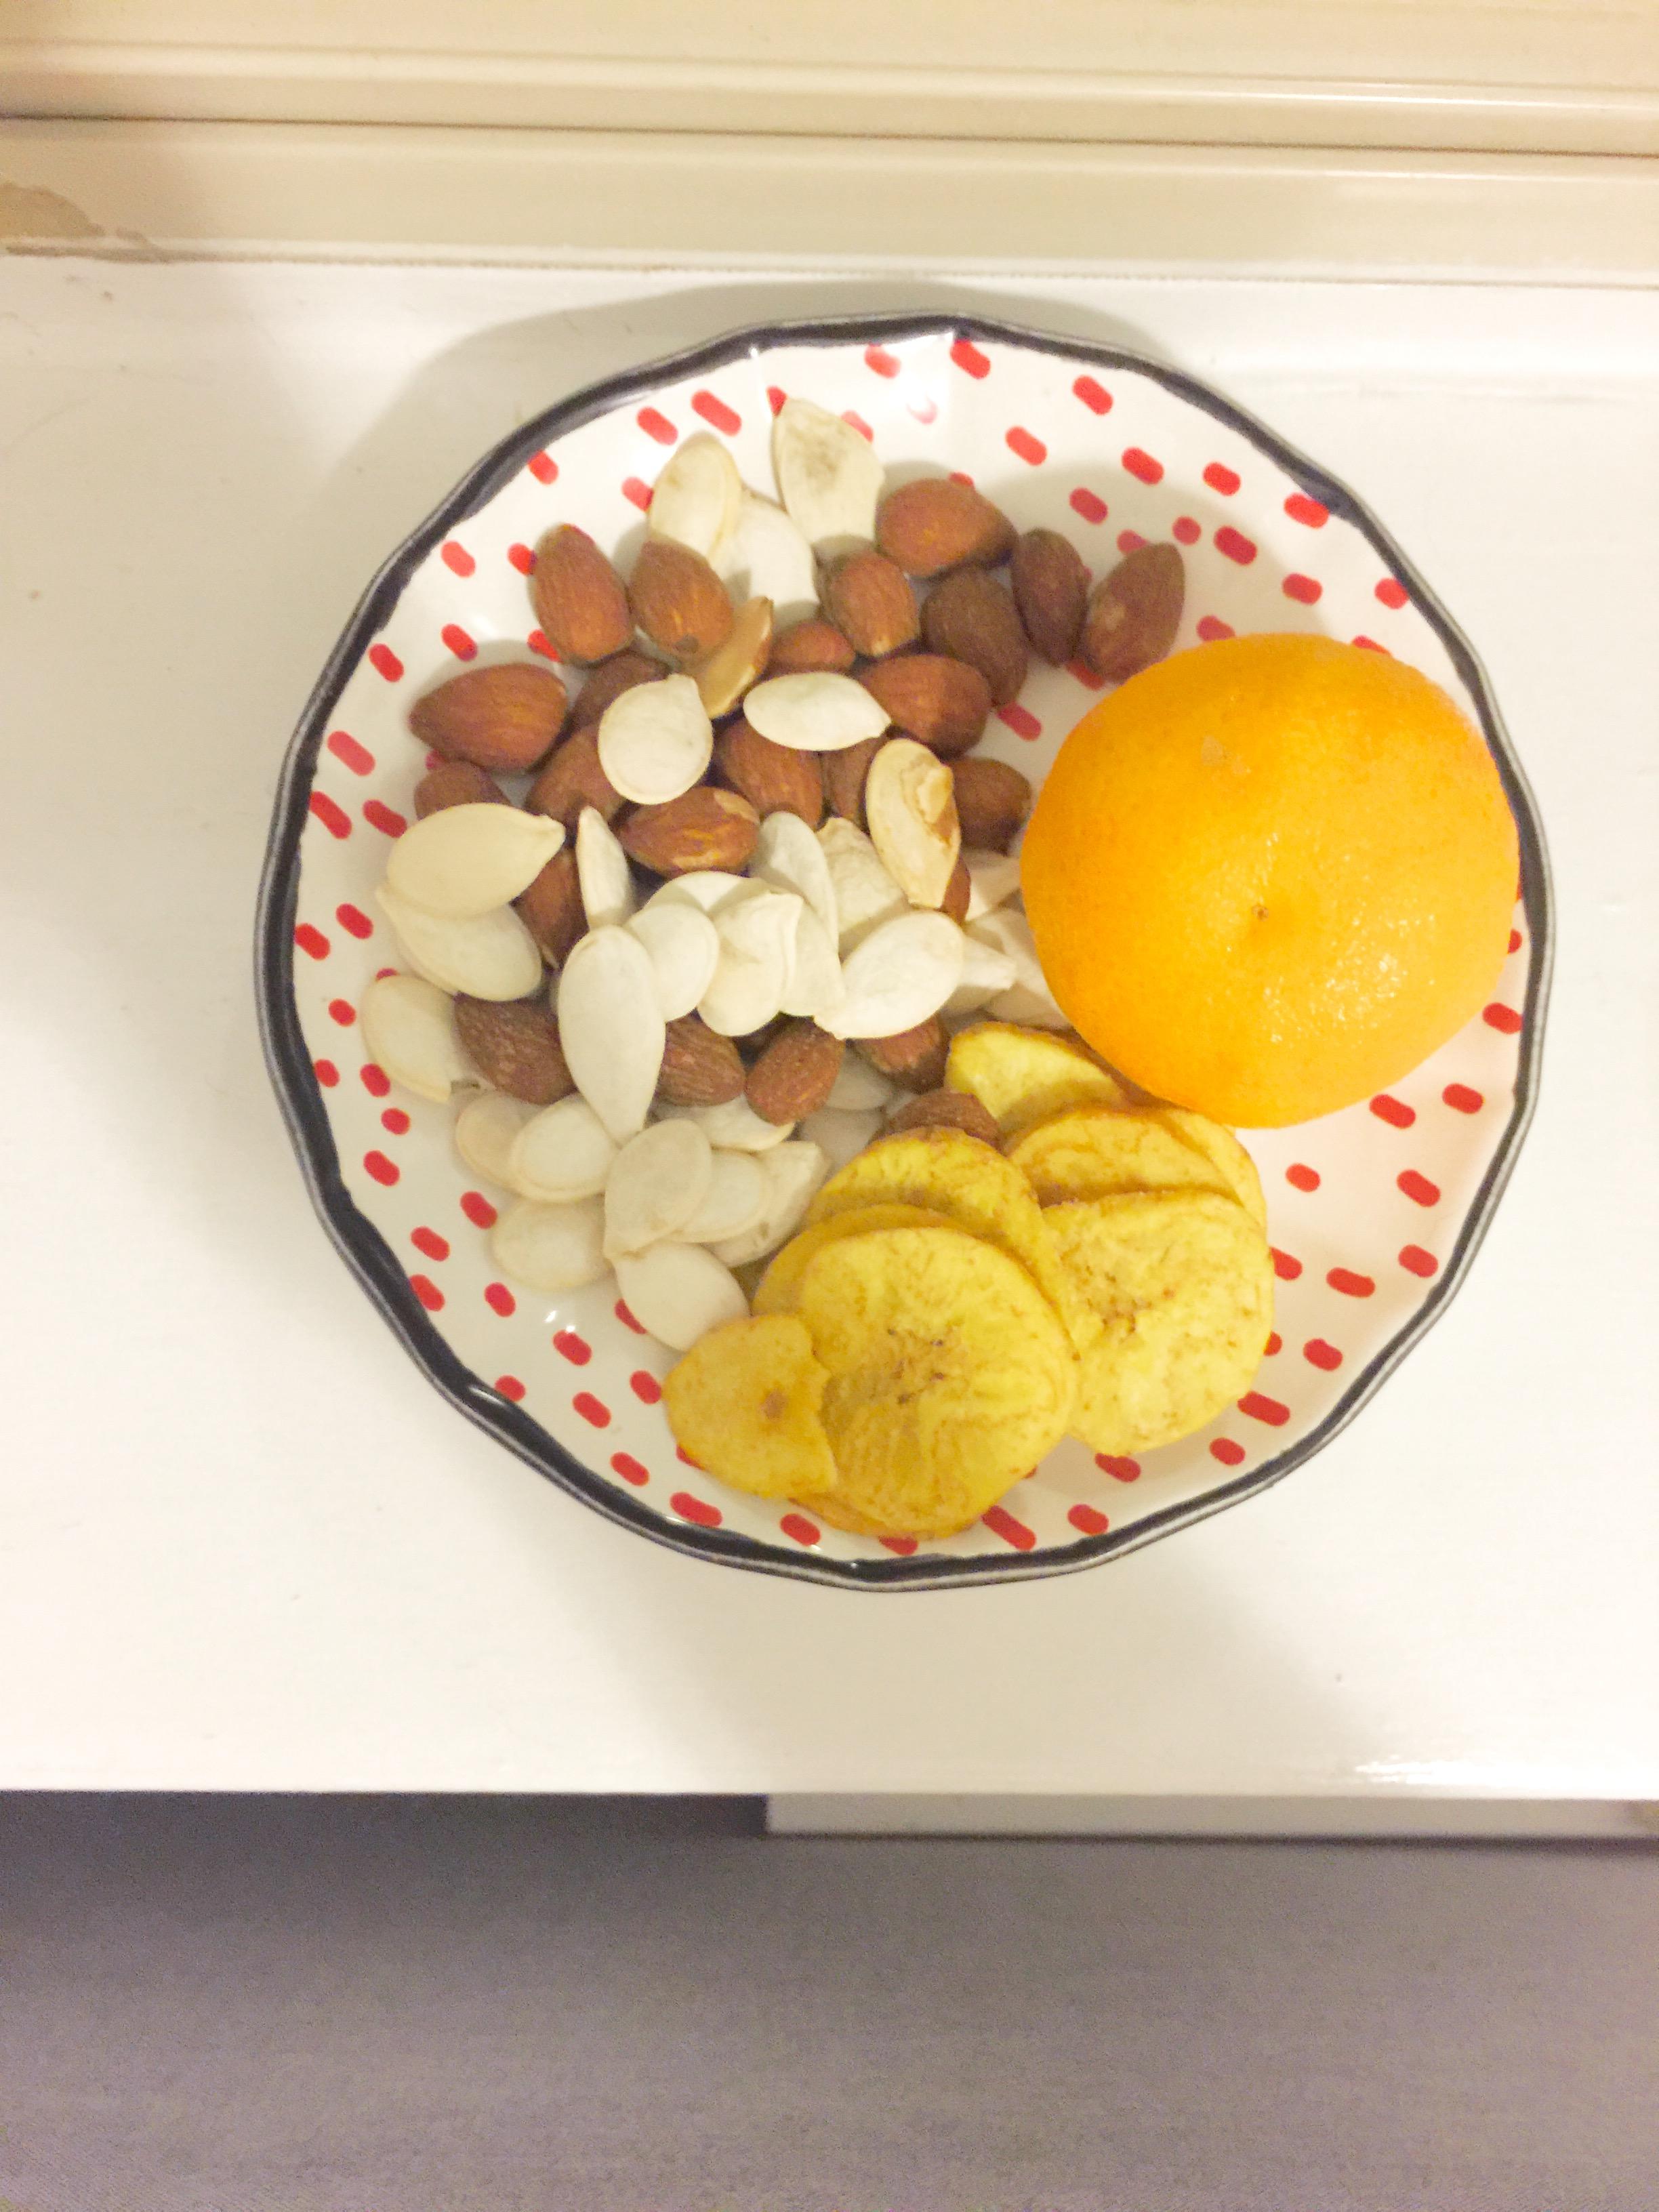 Almonds, pumpkin seeds, and a cutie orange